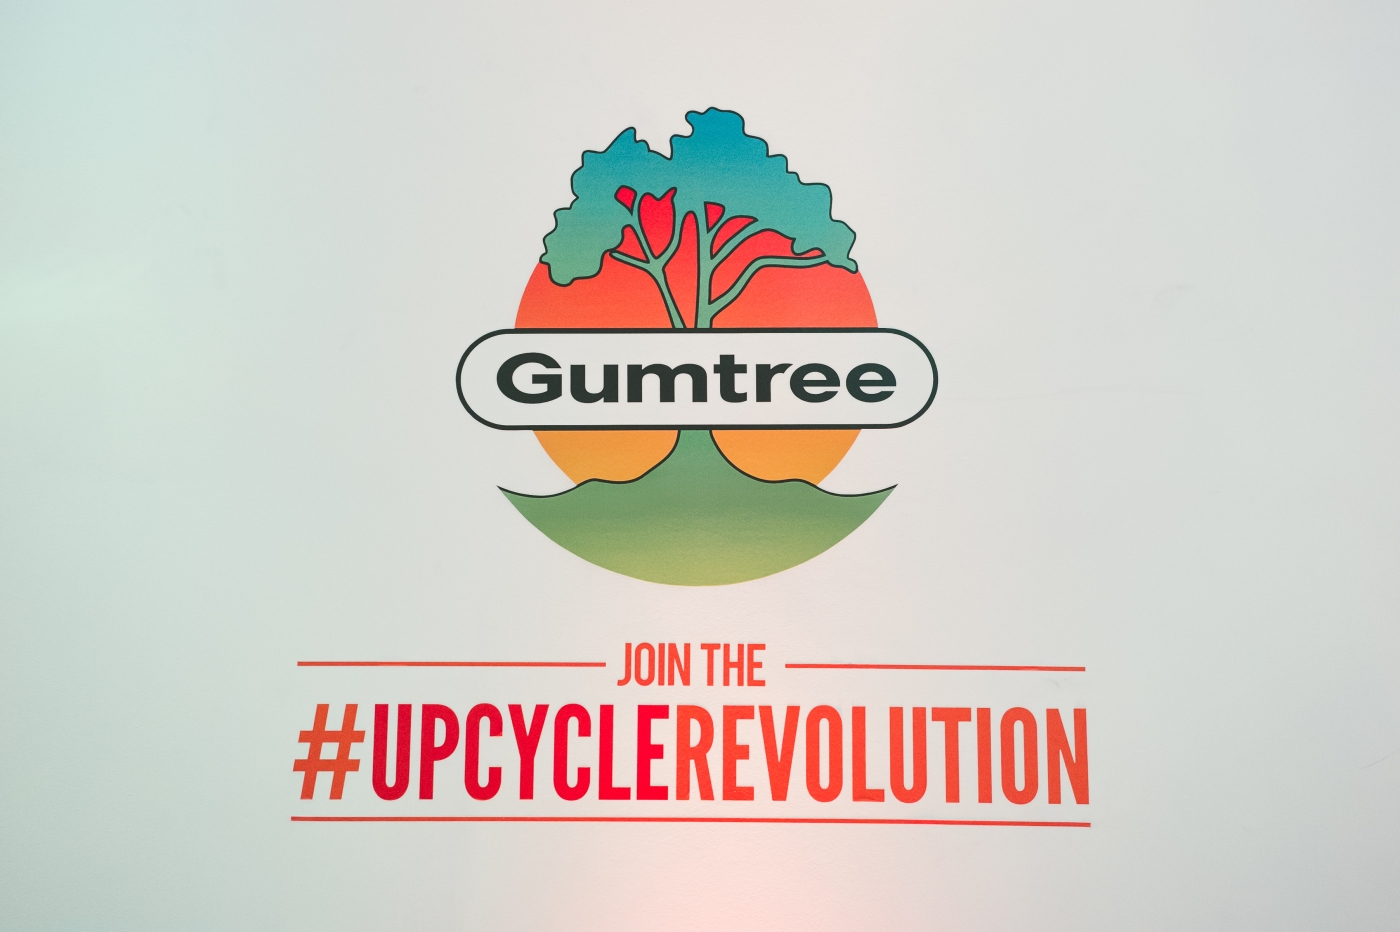 Upcycle Revolution